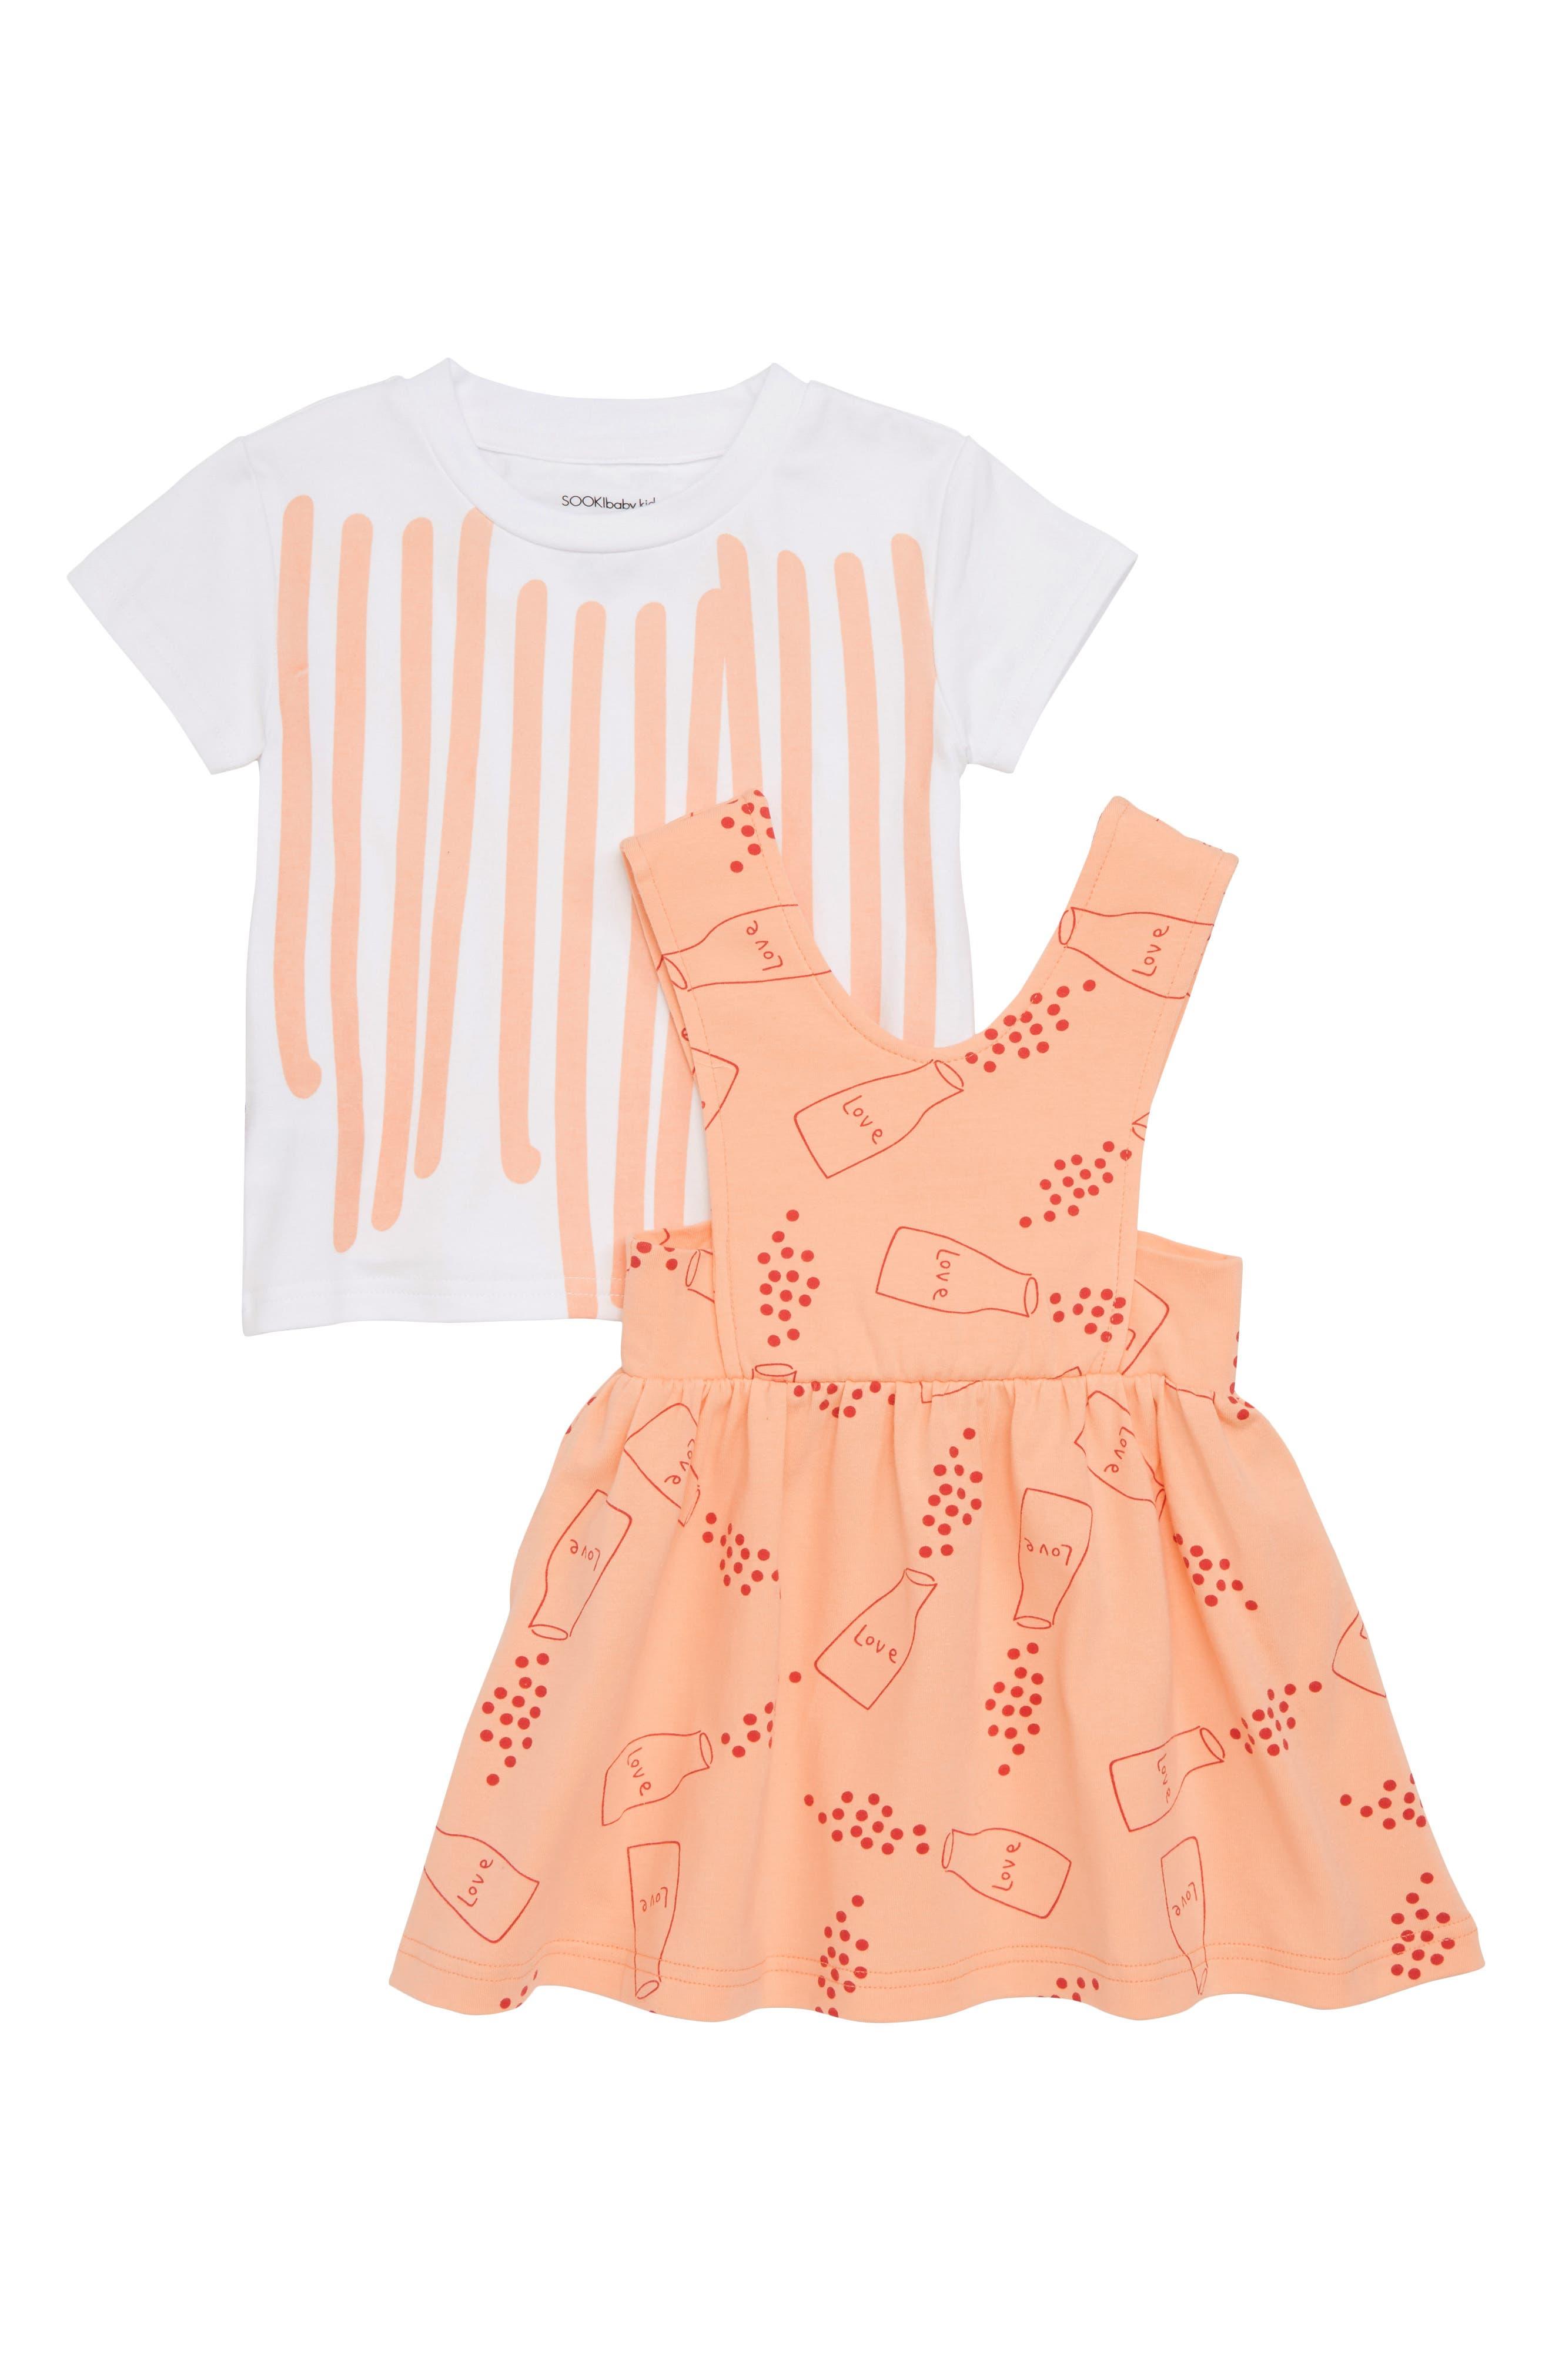 Stripe Tee & Sprinkle Love Pinafore Dress Set,                         Main,                         color, White / Peach